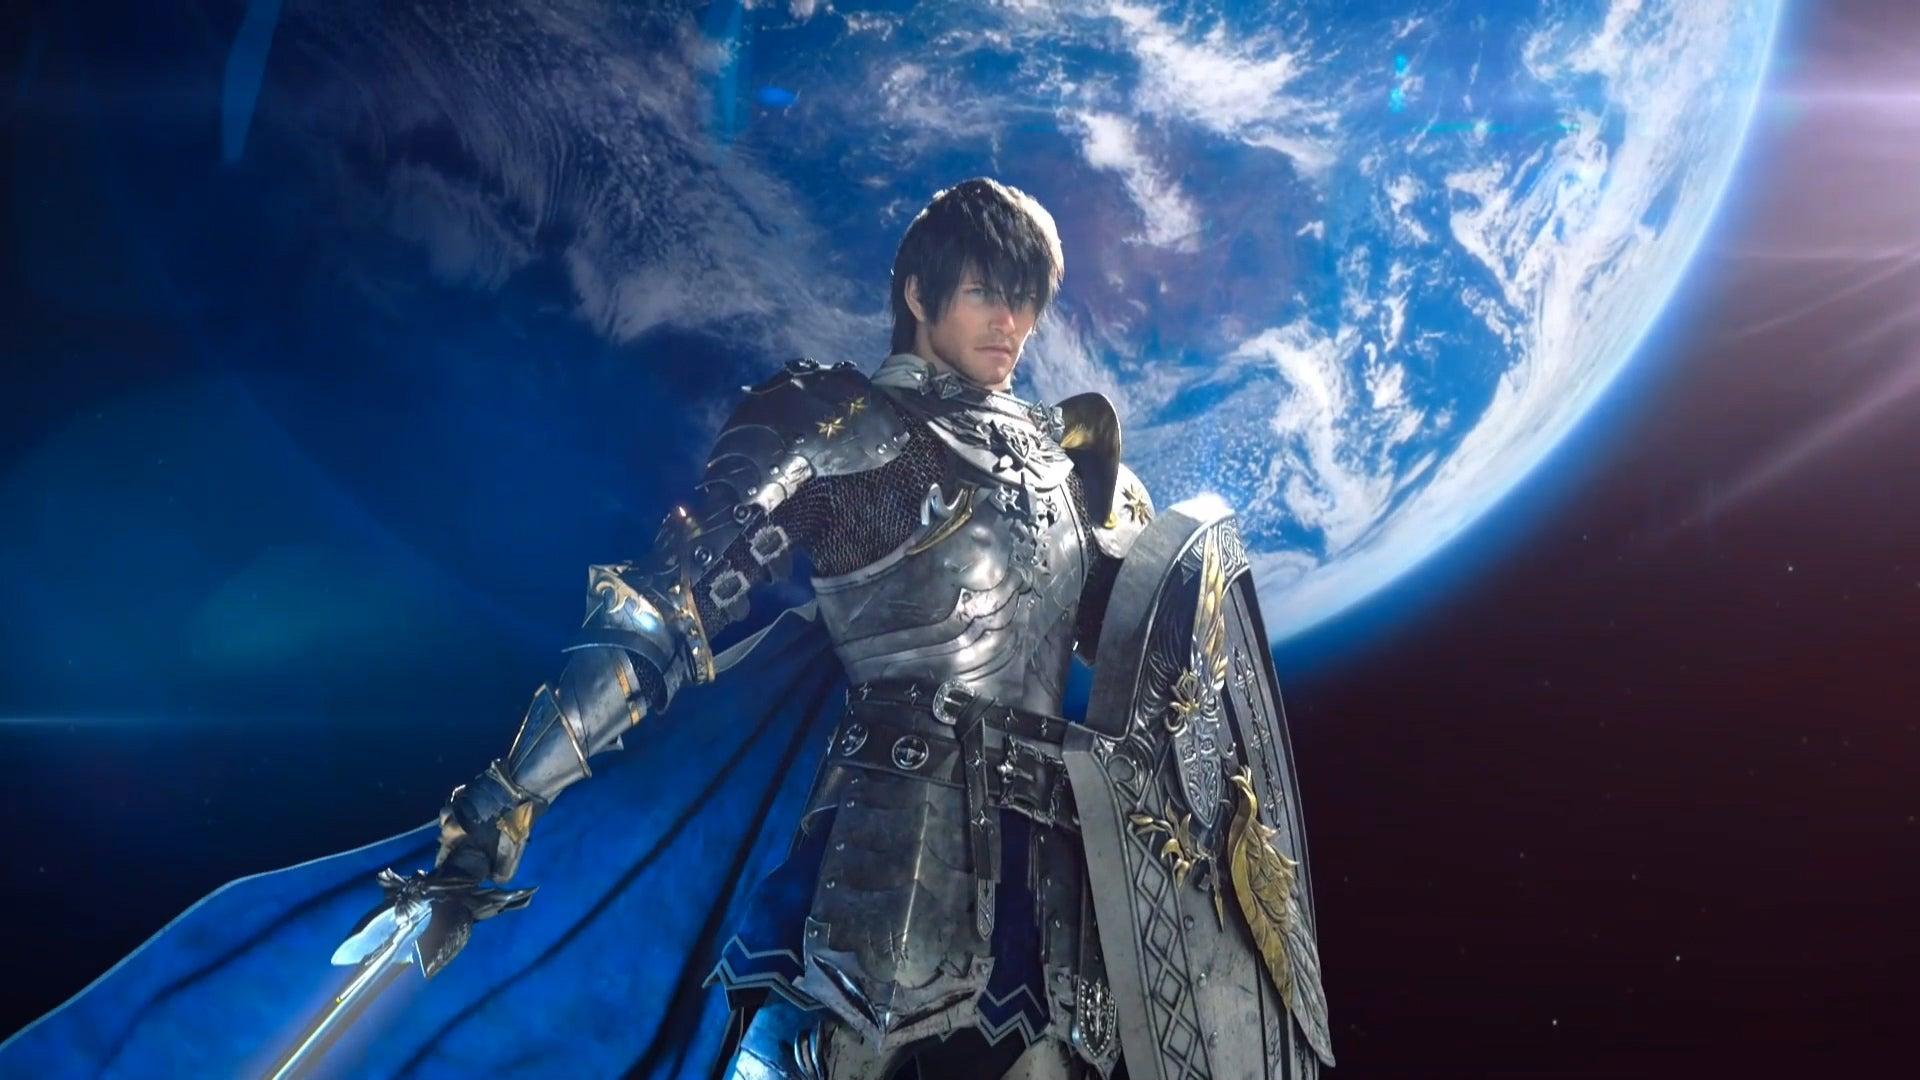 Final Fantasy XIV Paladin From Endwalker